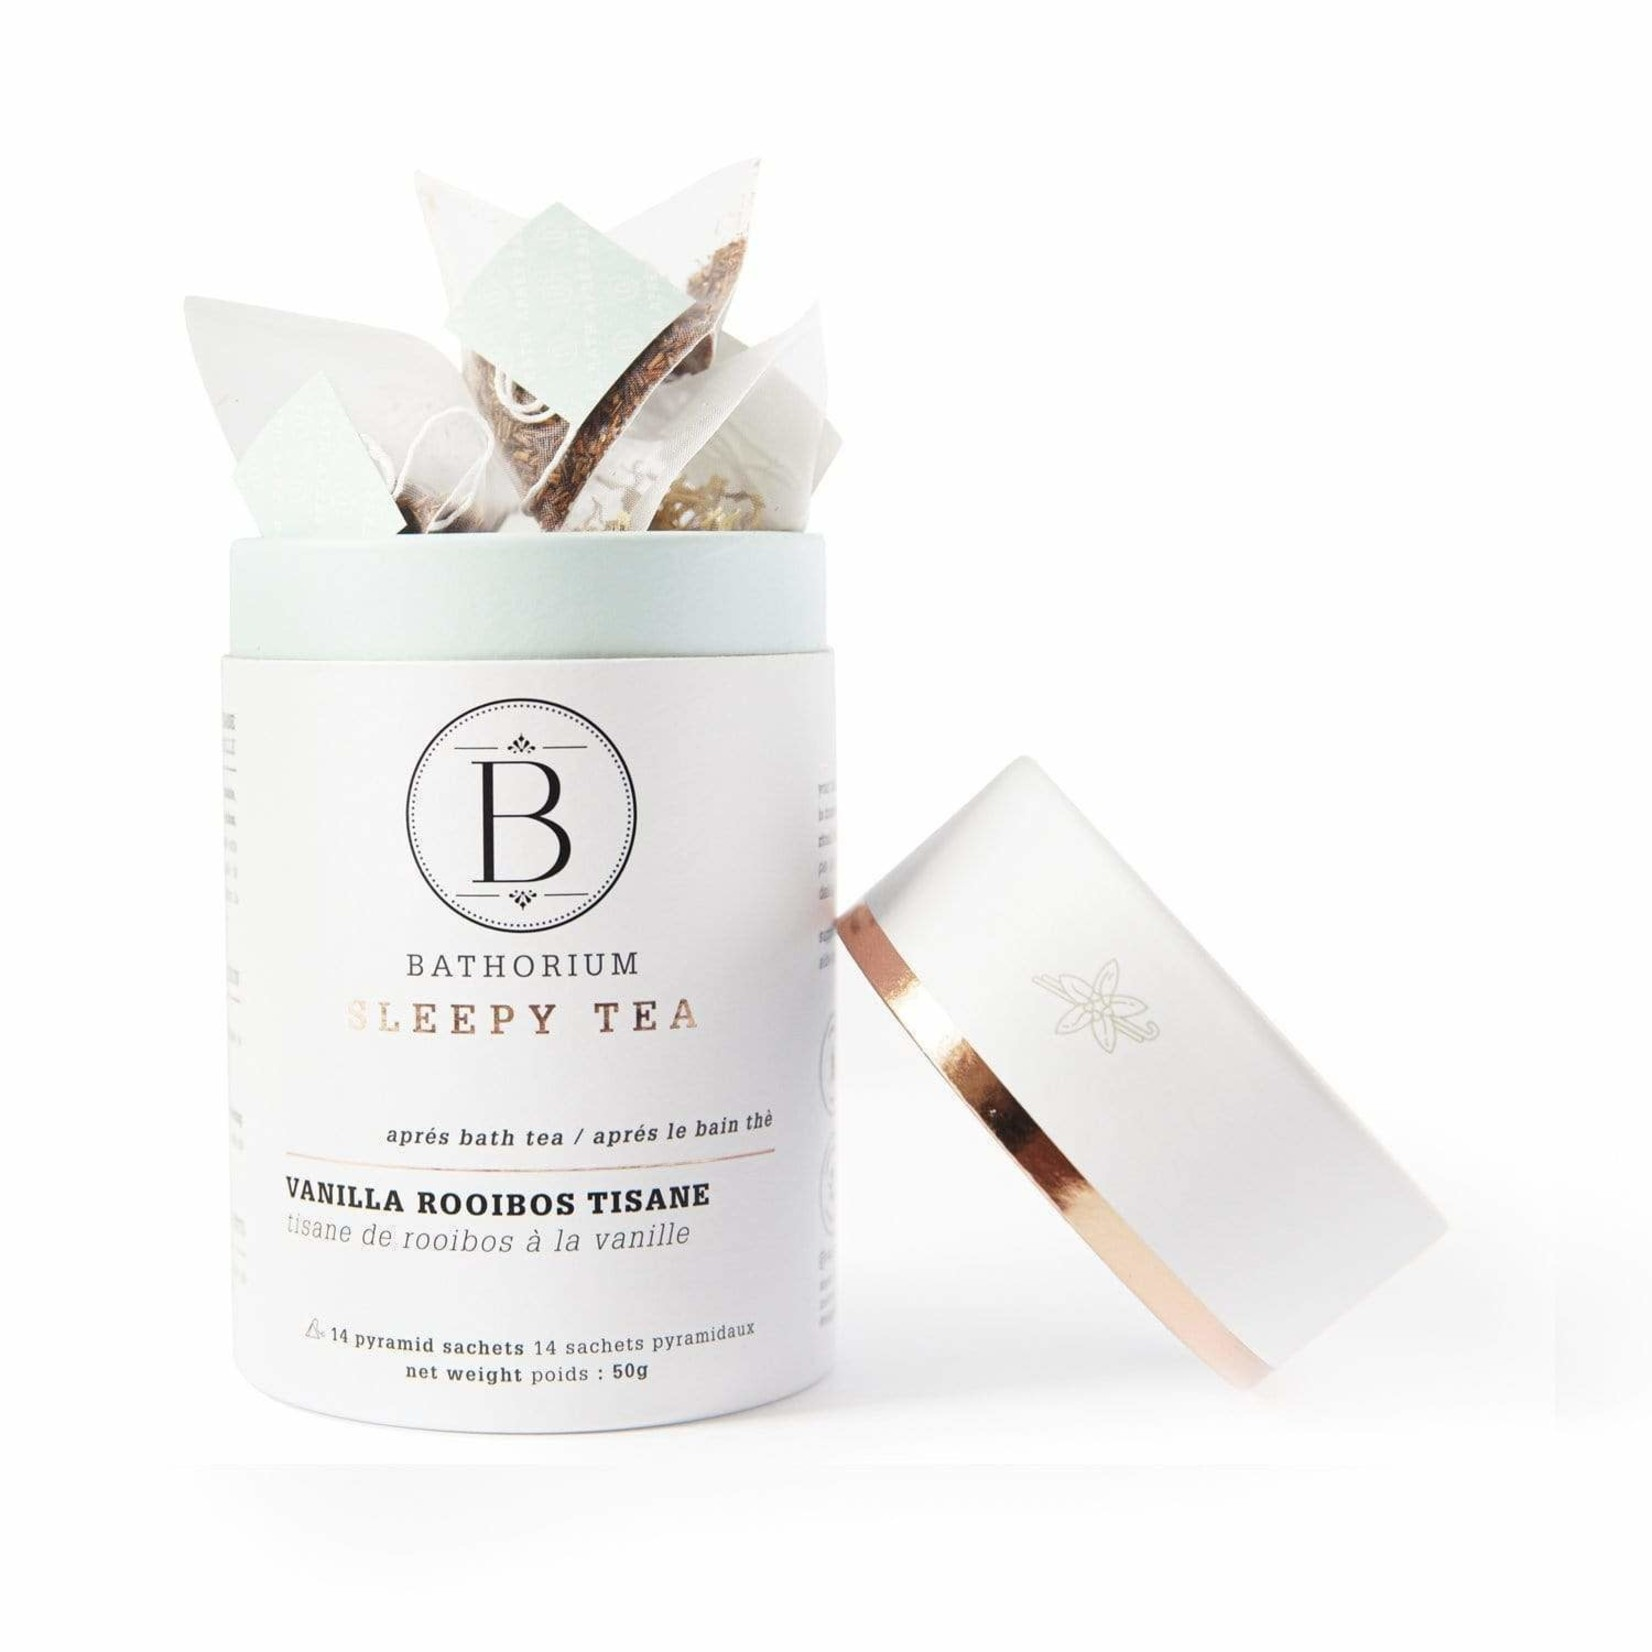 BATHORIUM APRES BATH TEA - VANILLA ROOBIOS TISANE